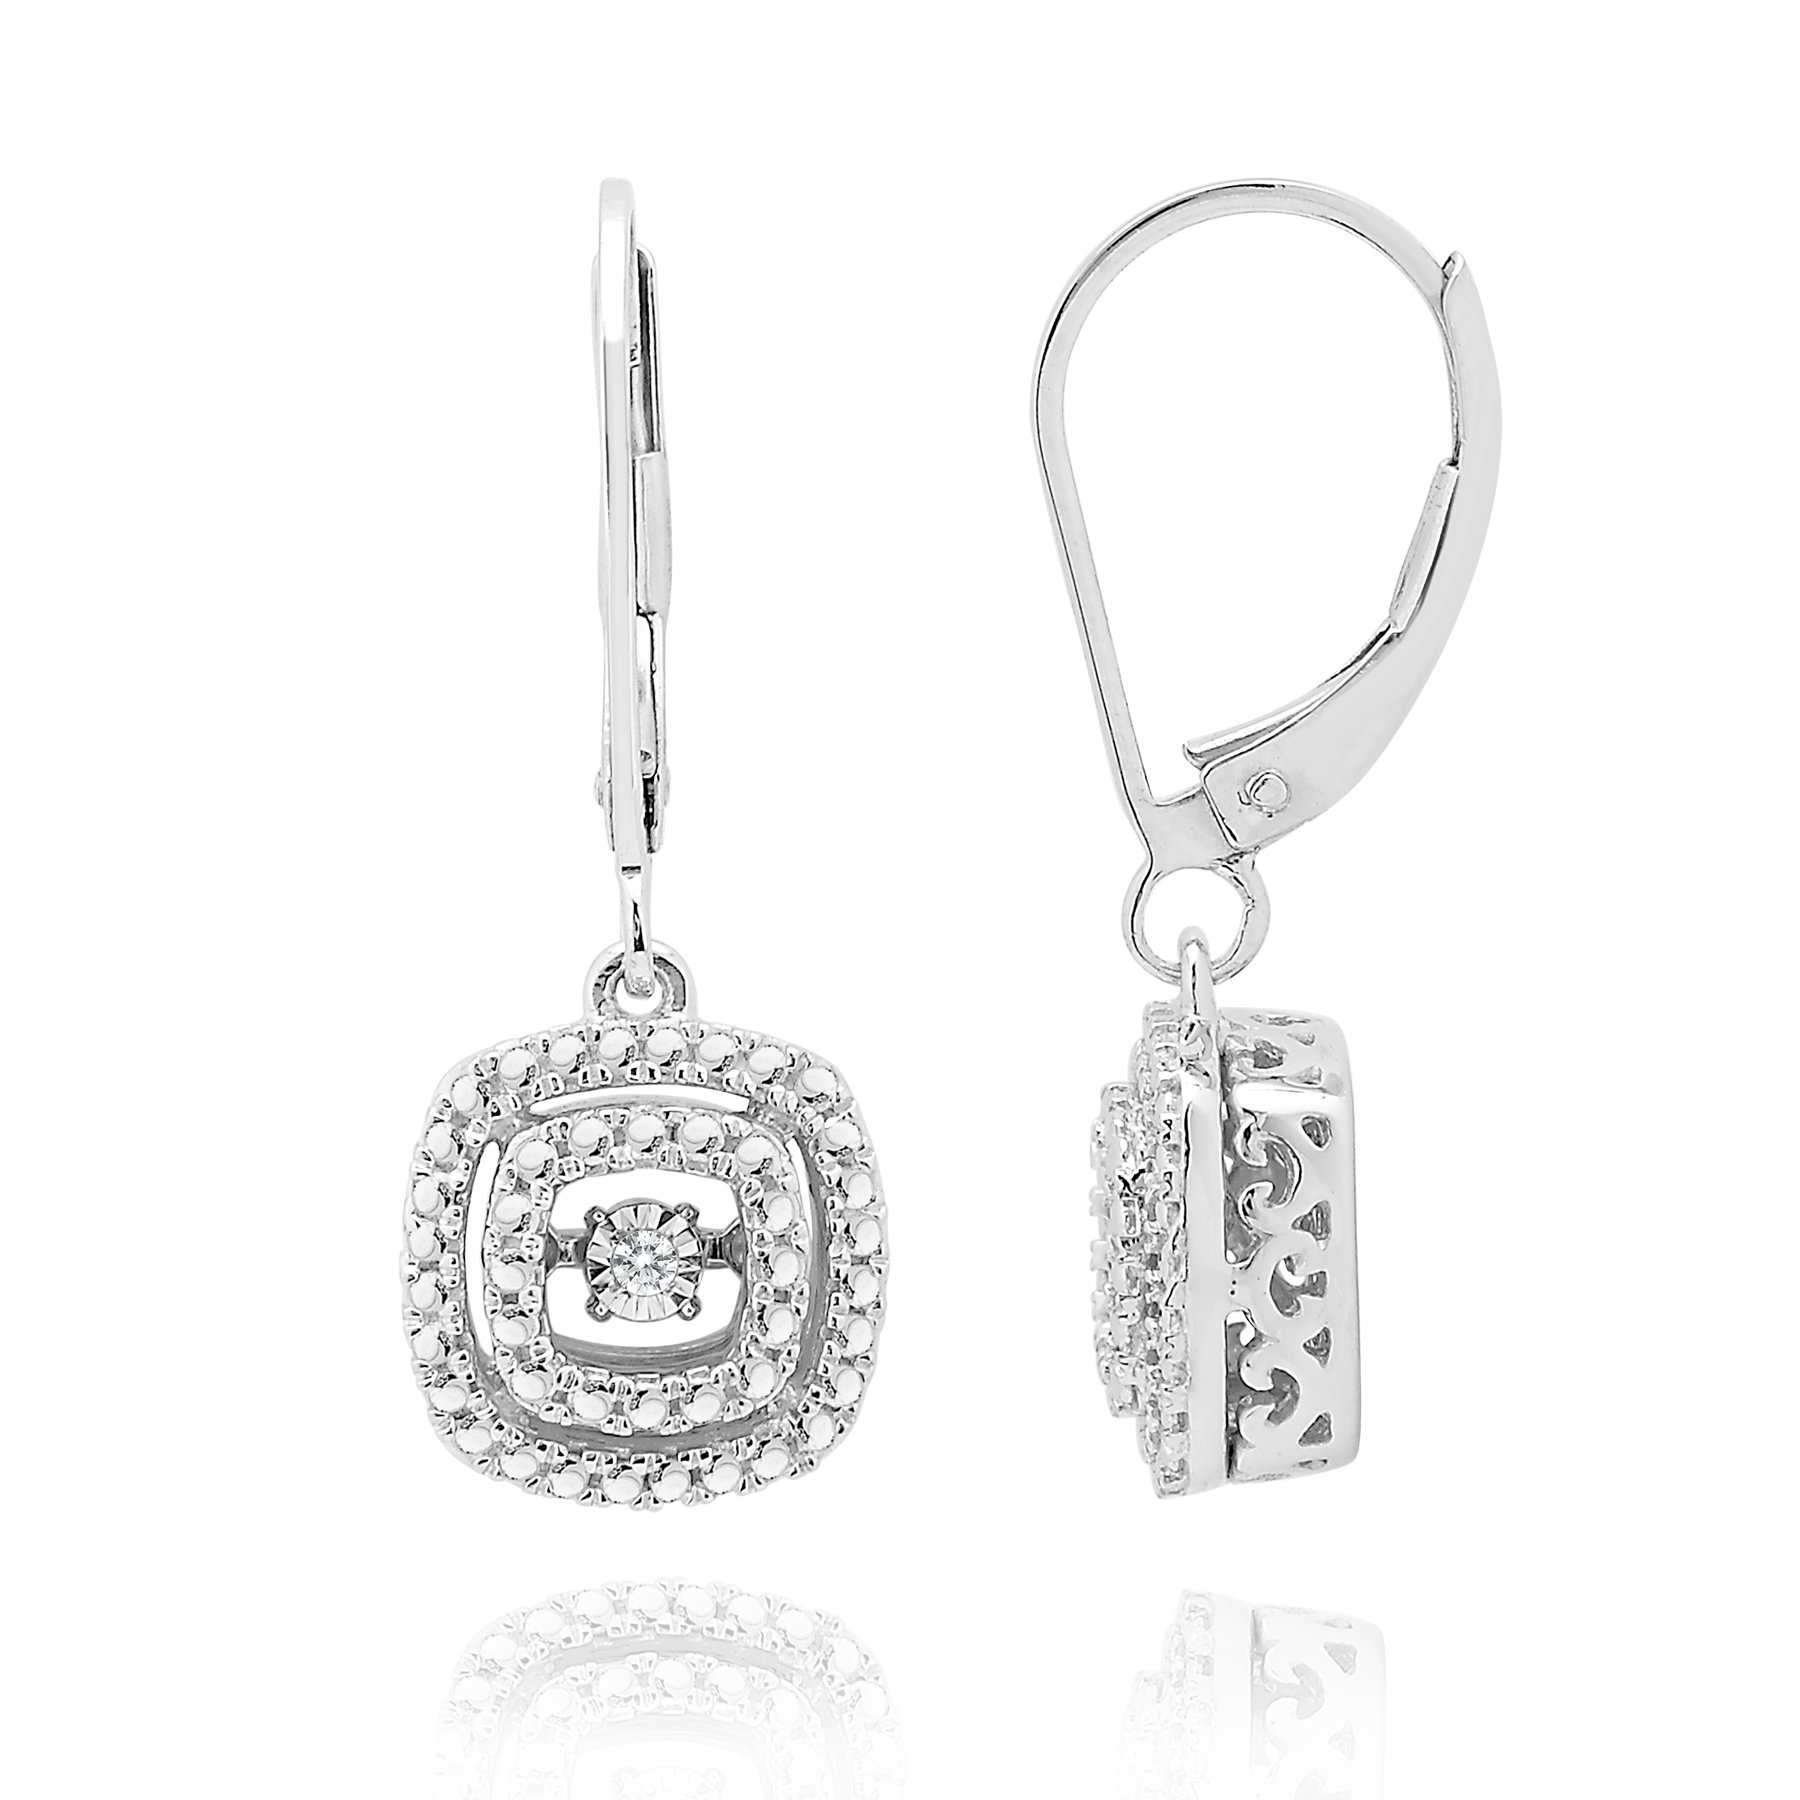 2bd5bf22f5377 Rhythm of Love Diamond Earrings in sterling silver